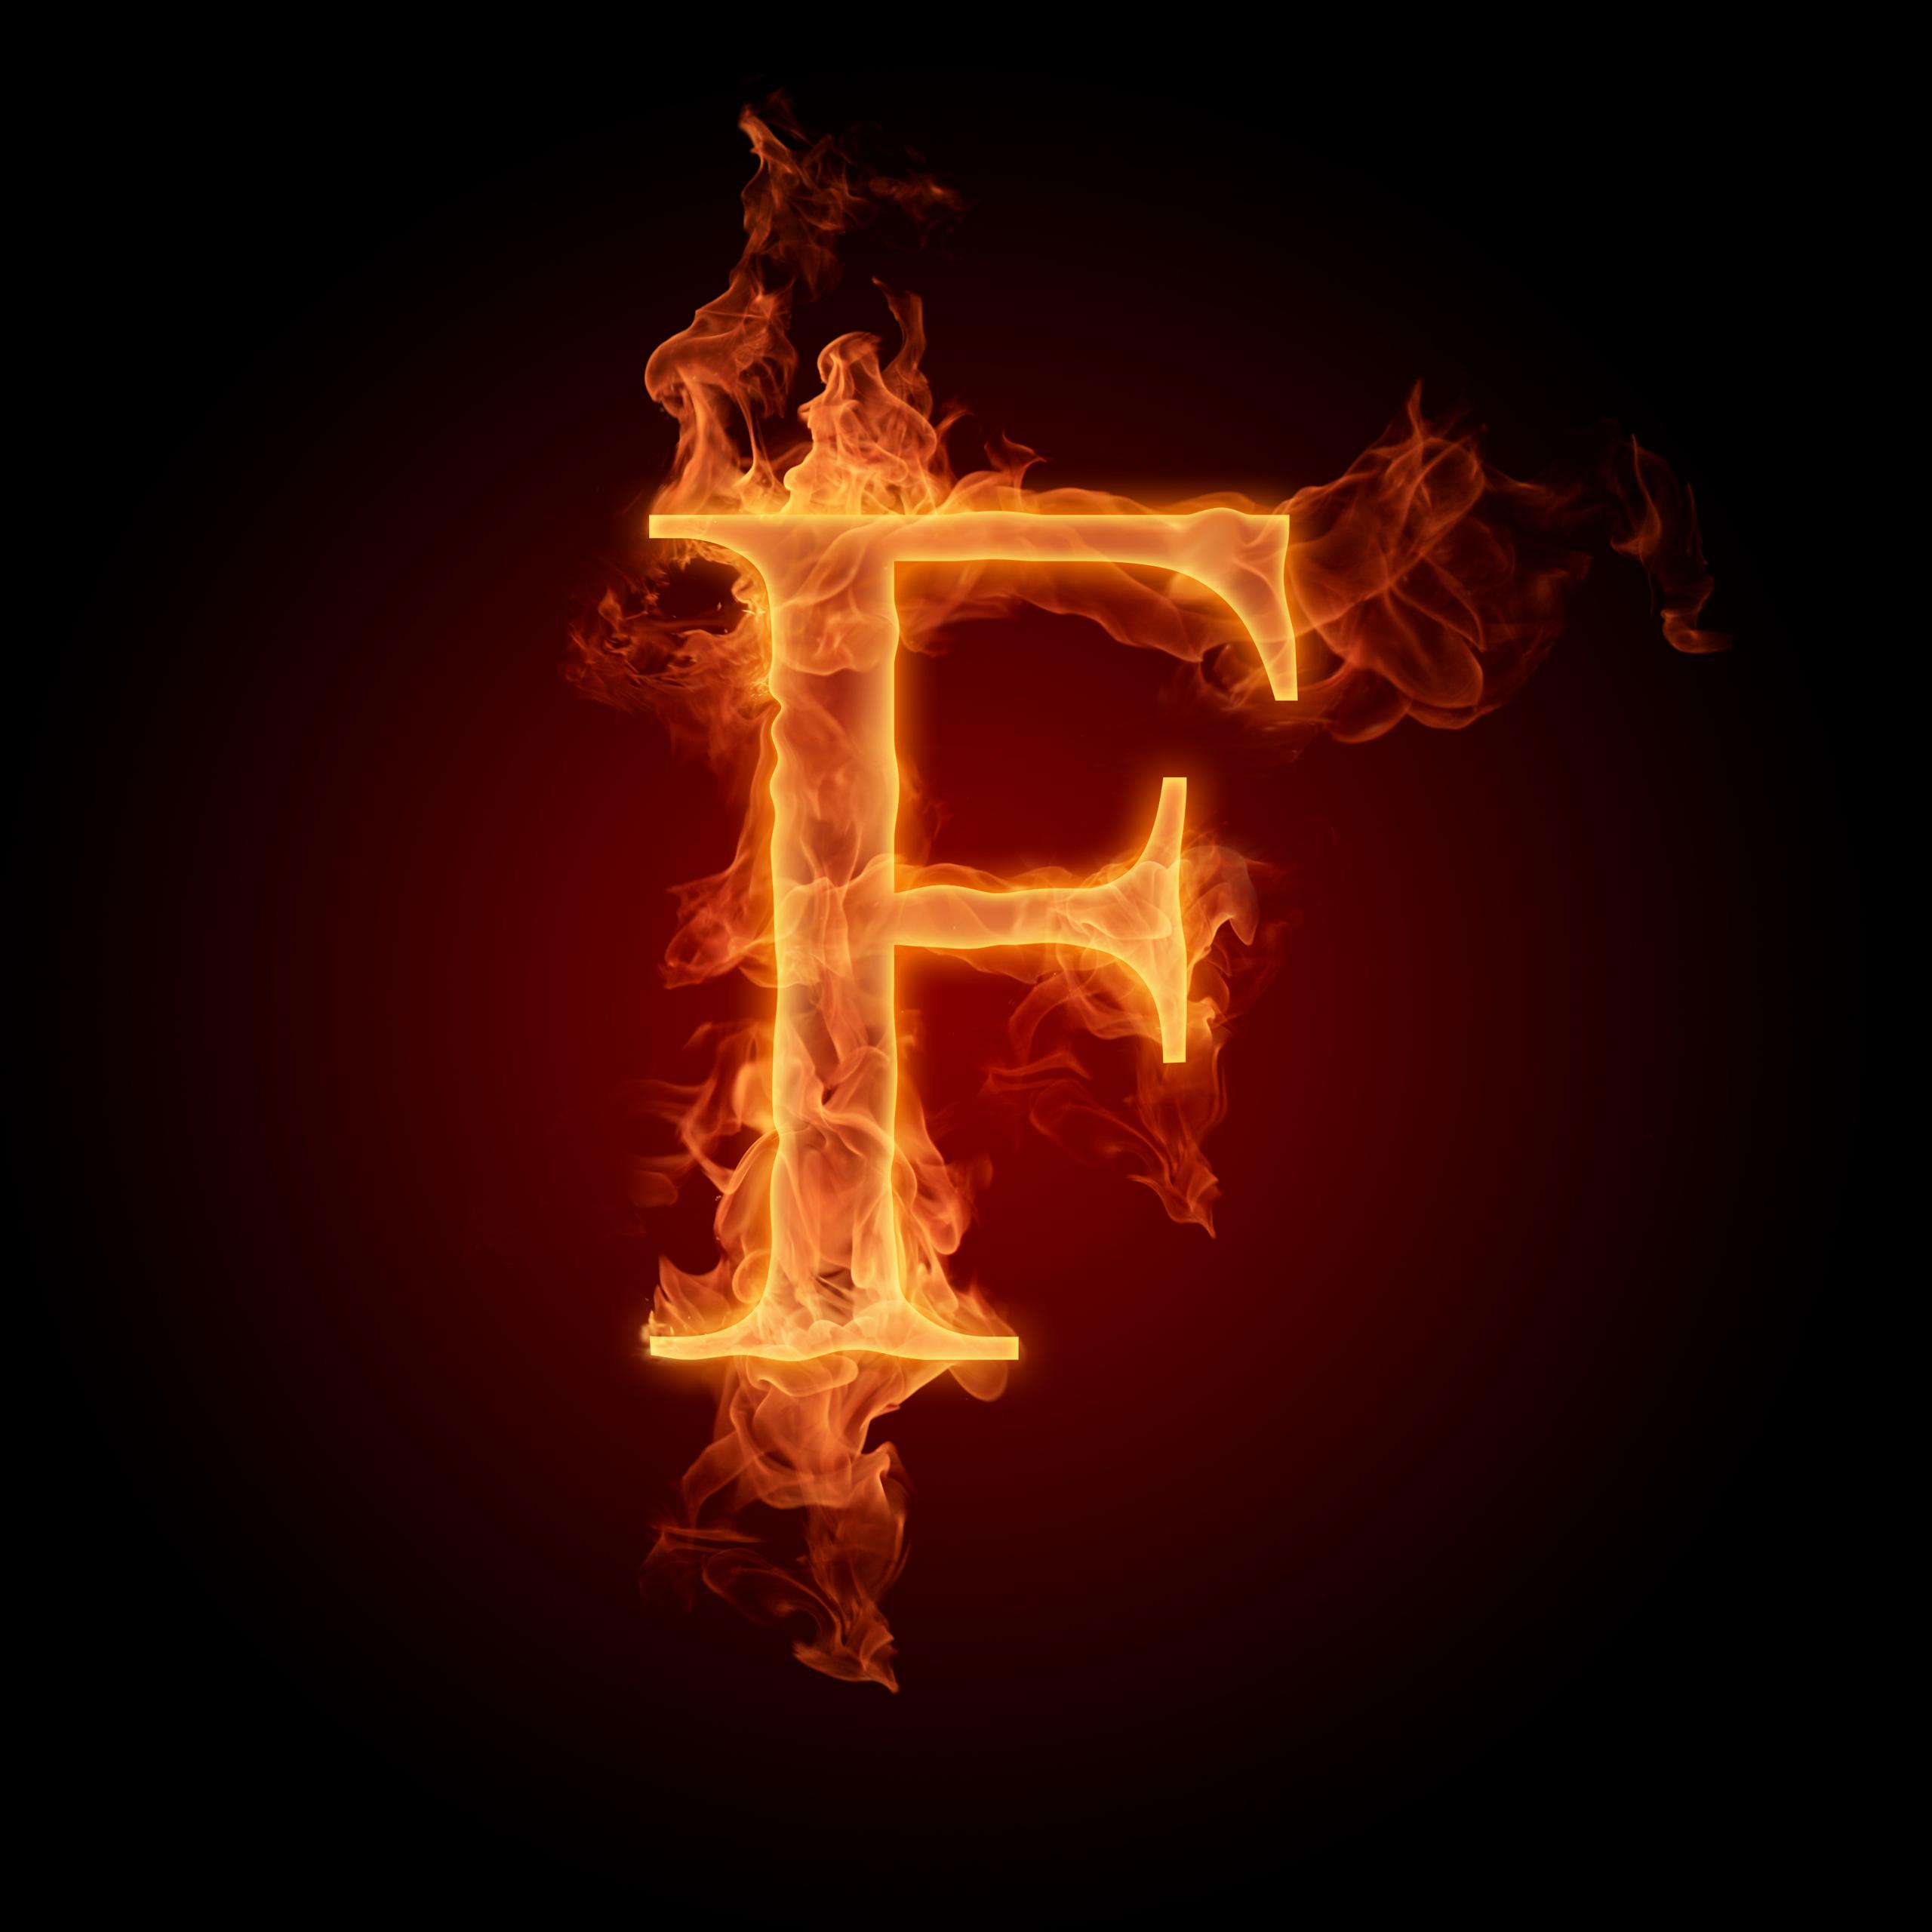 بالصور صور حرف f , كولكشن رائع عن حرف F 3141 1